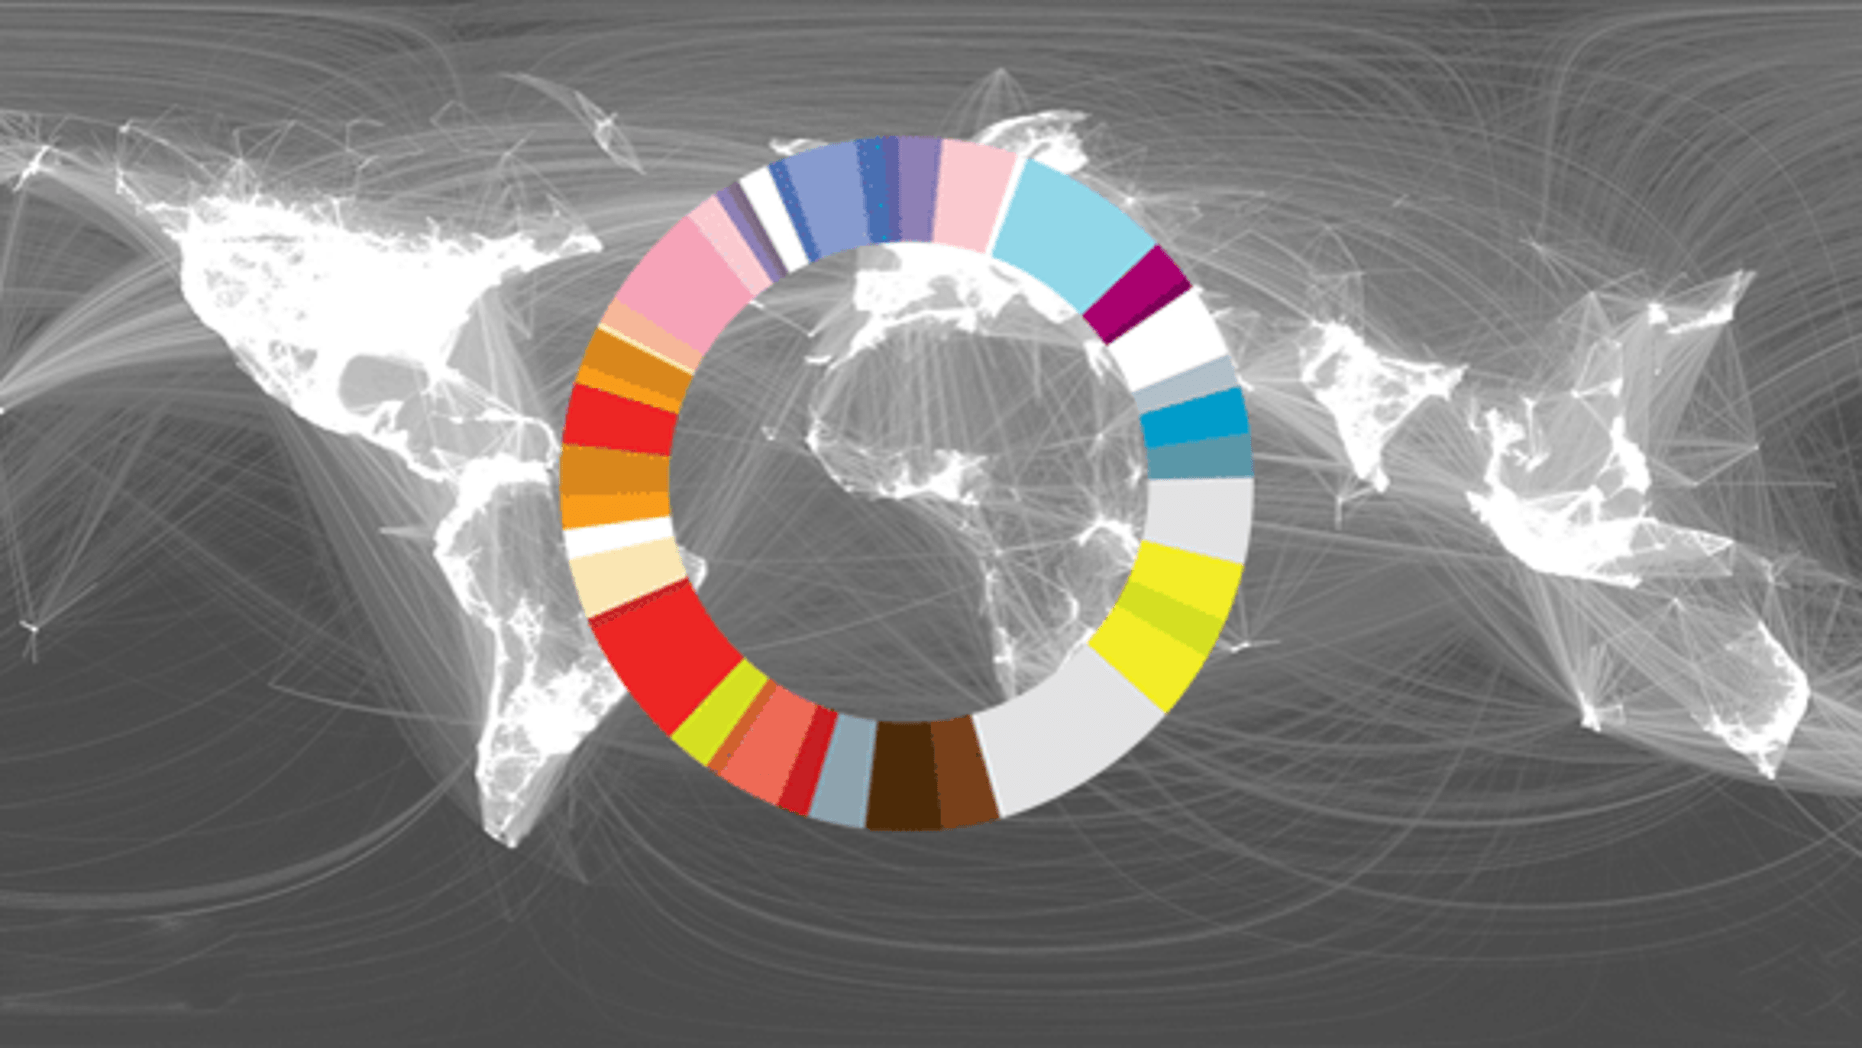 Global Entrepreneurship Week Official Logo http://www.unleashingideas.org/